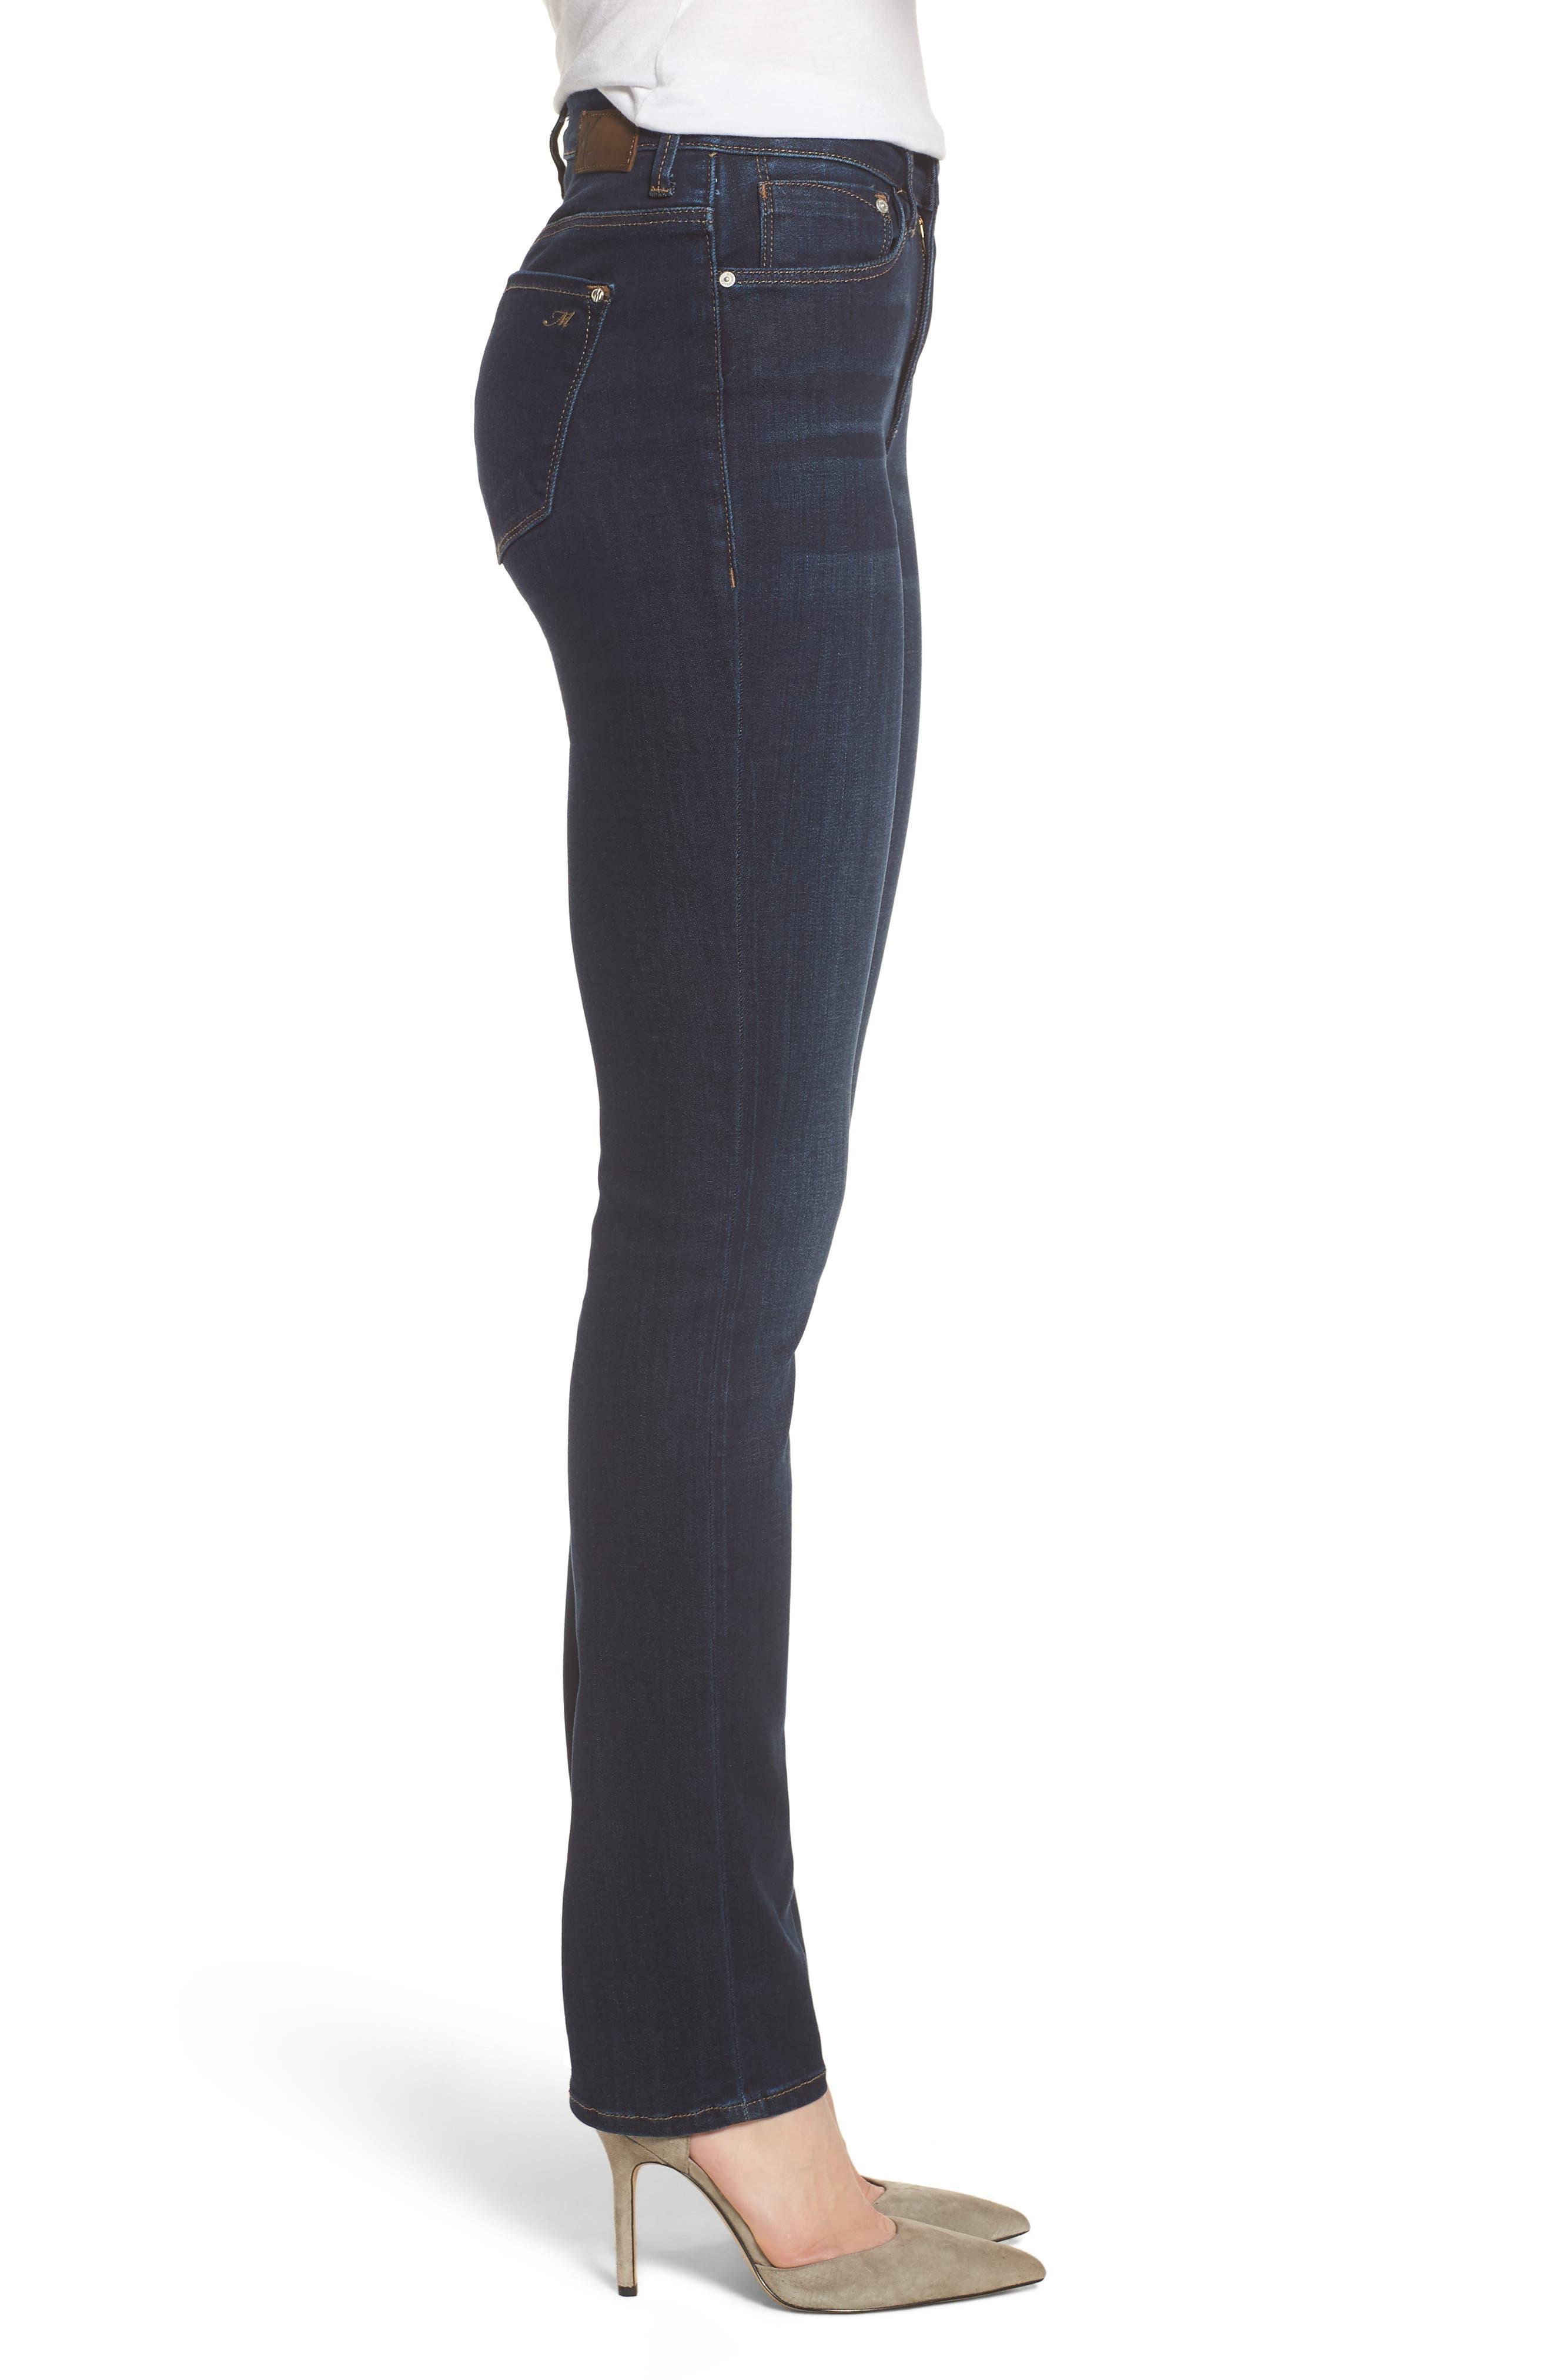 Kendra Straight Leg Jeans,                             Alternate thumbnail 3, color,                             DEEP SUPERSOFT